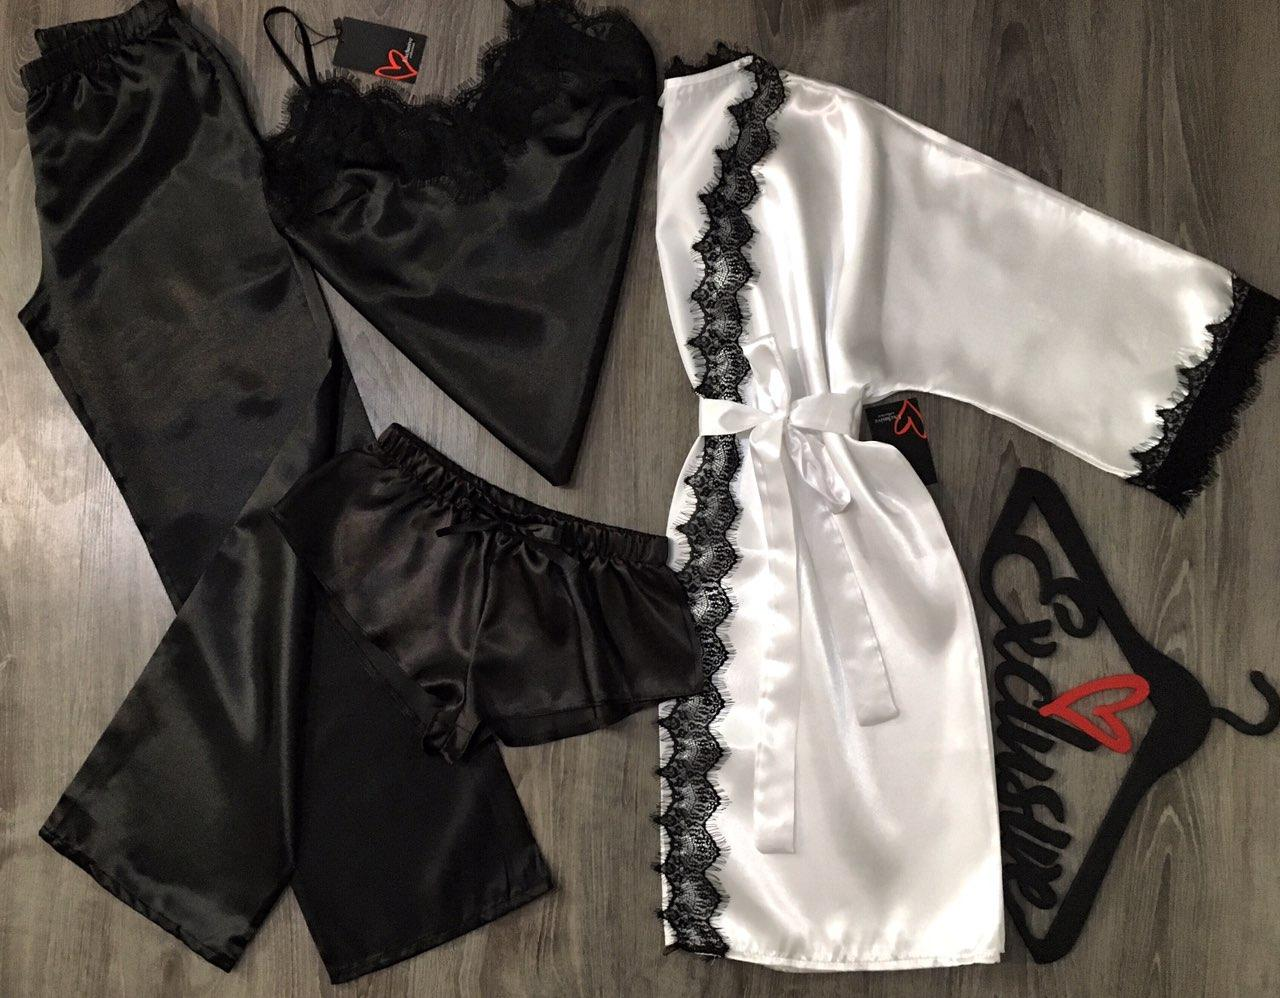 Комплект домашней одежды 4 предмета халат+майка+штаны+шорты.